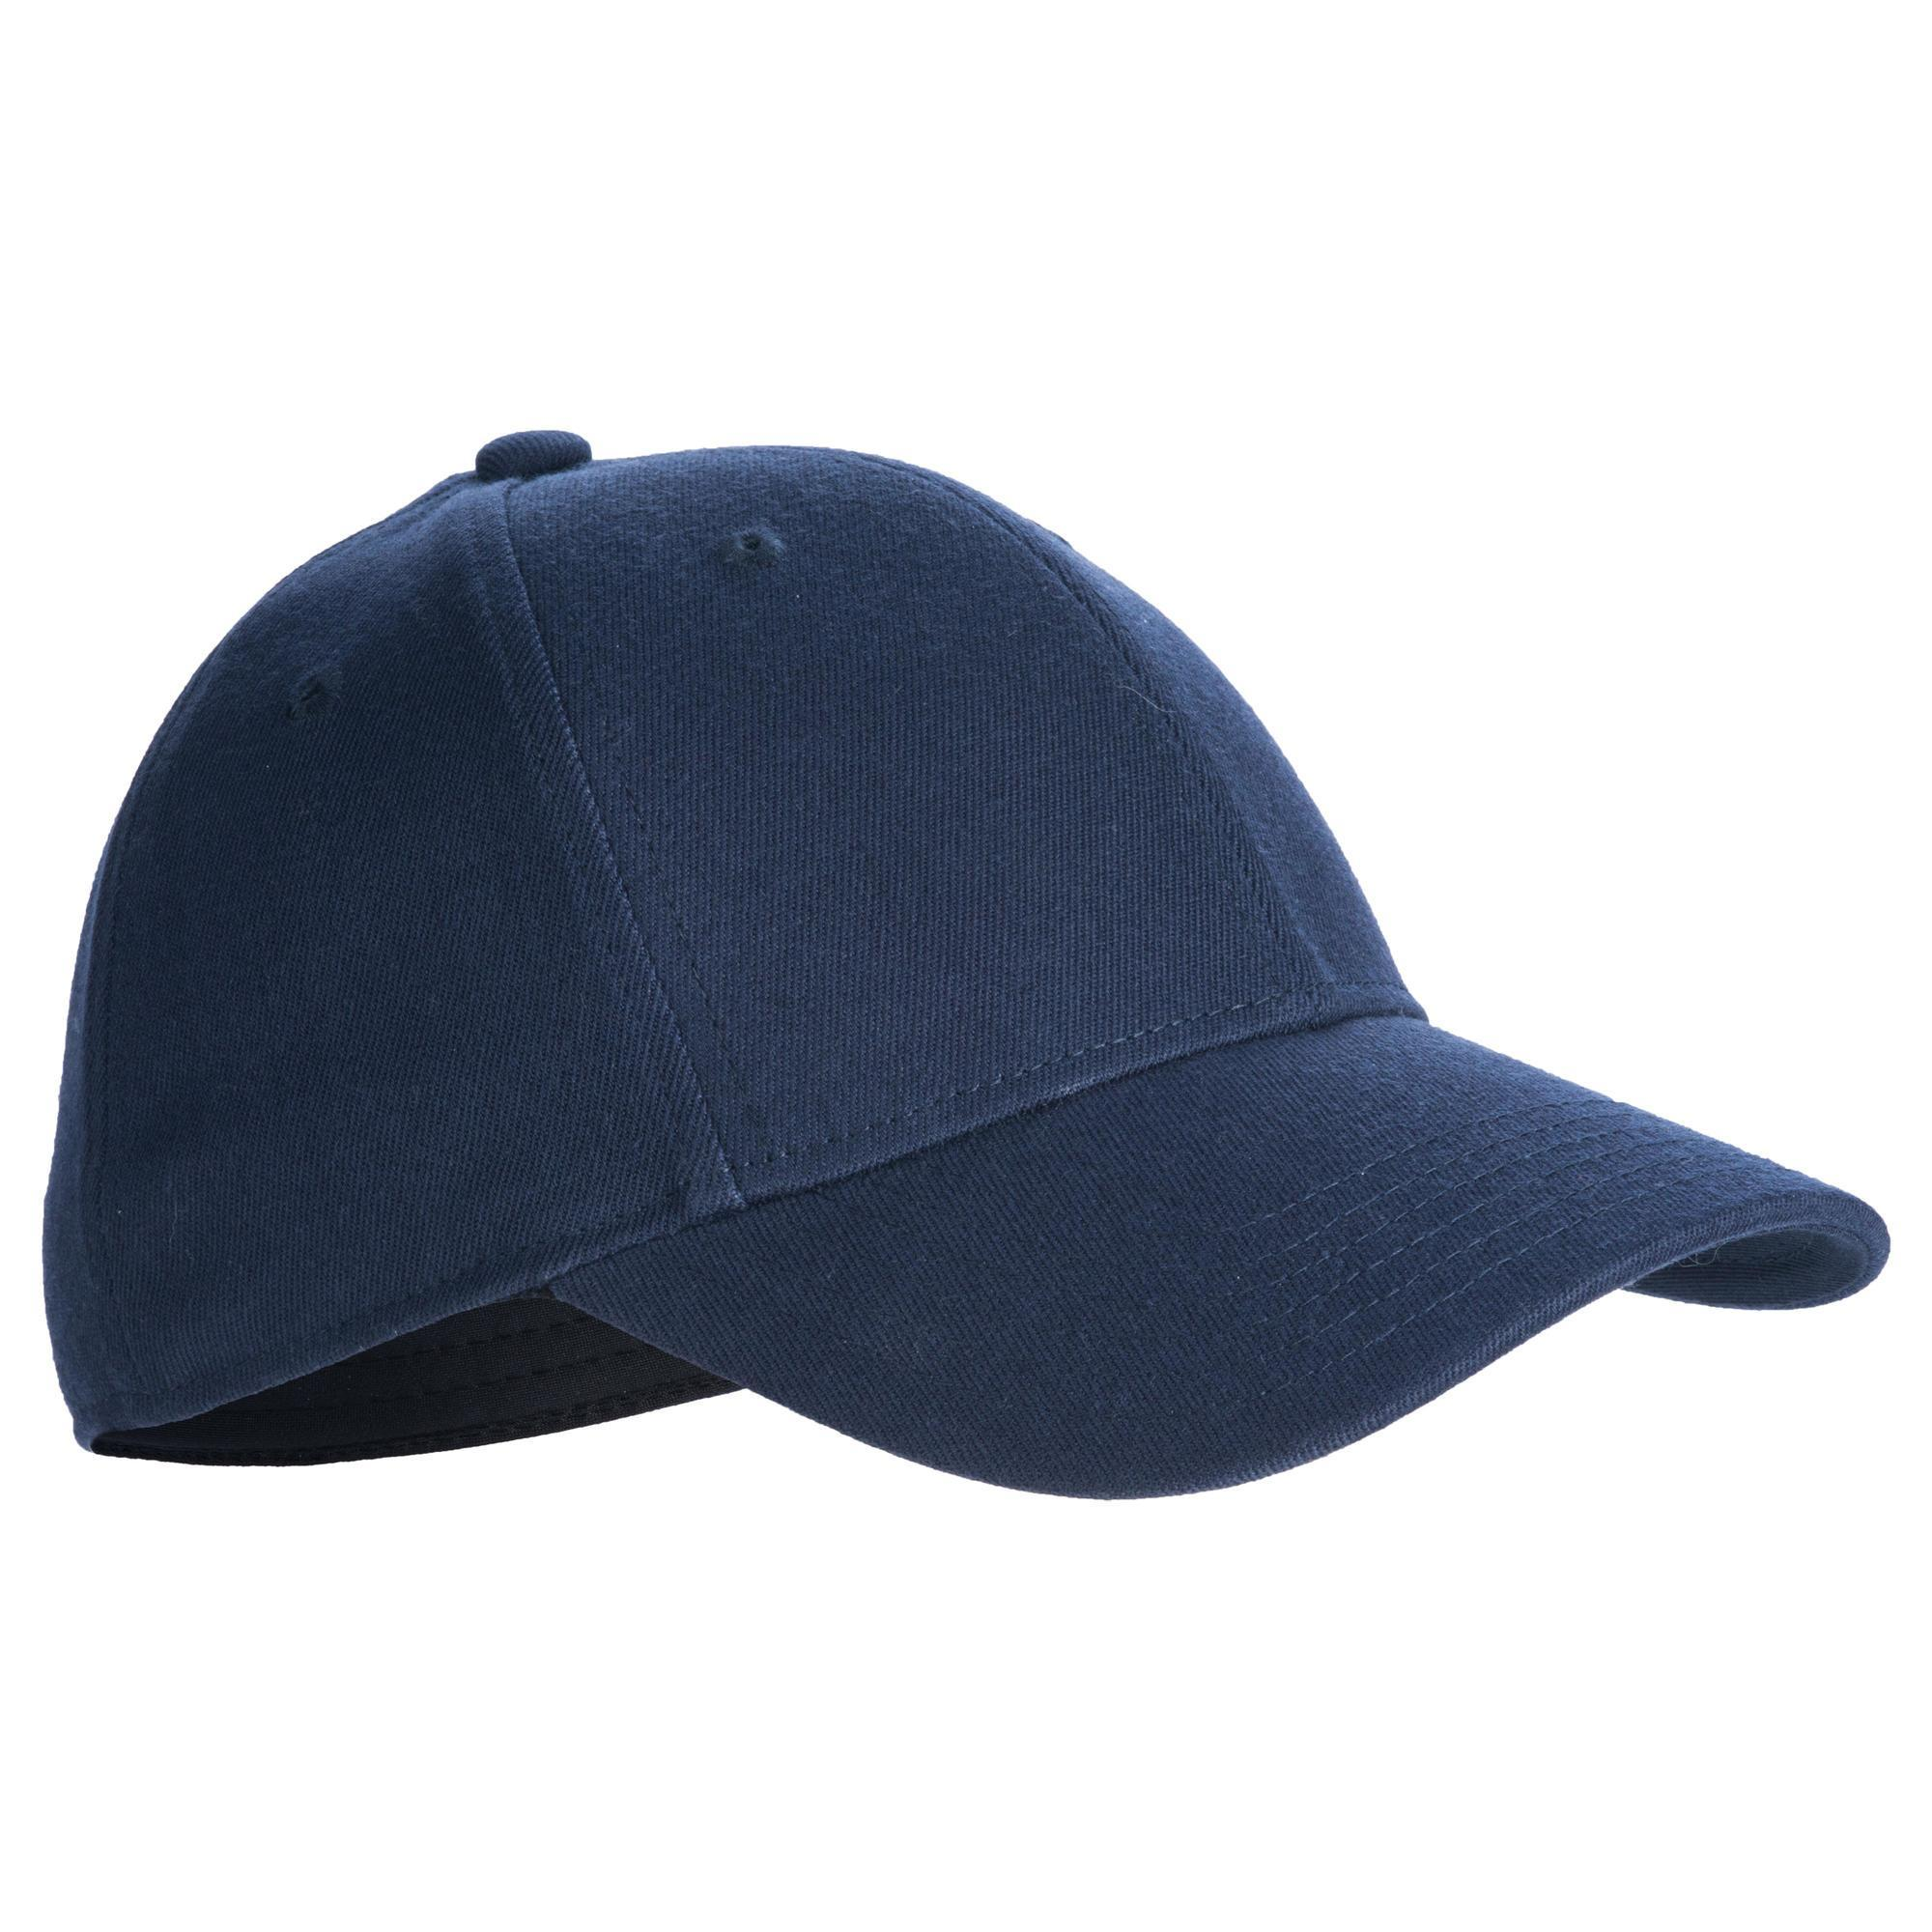 Baseballcap BA 550 blau | Accessoires > Caps > Baseball Caps | Blau | Kipsta